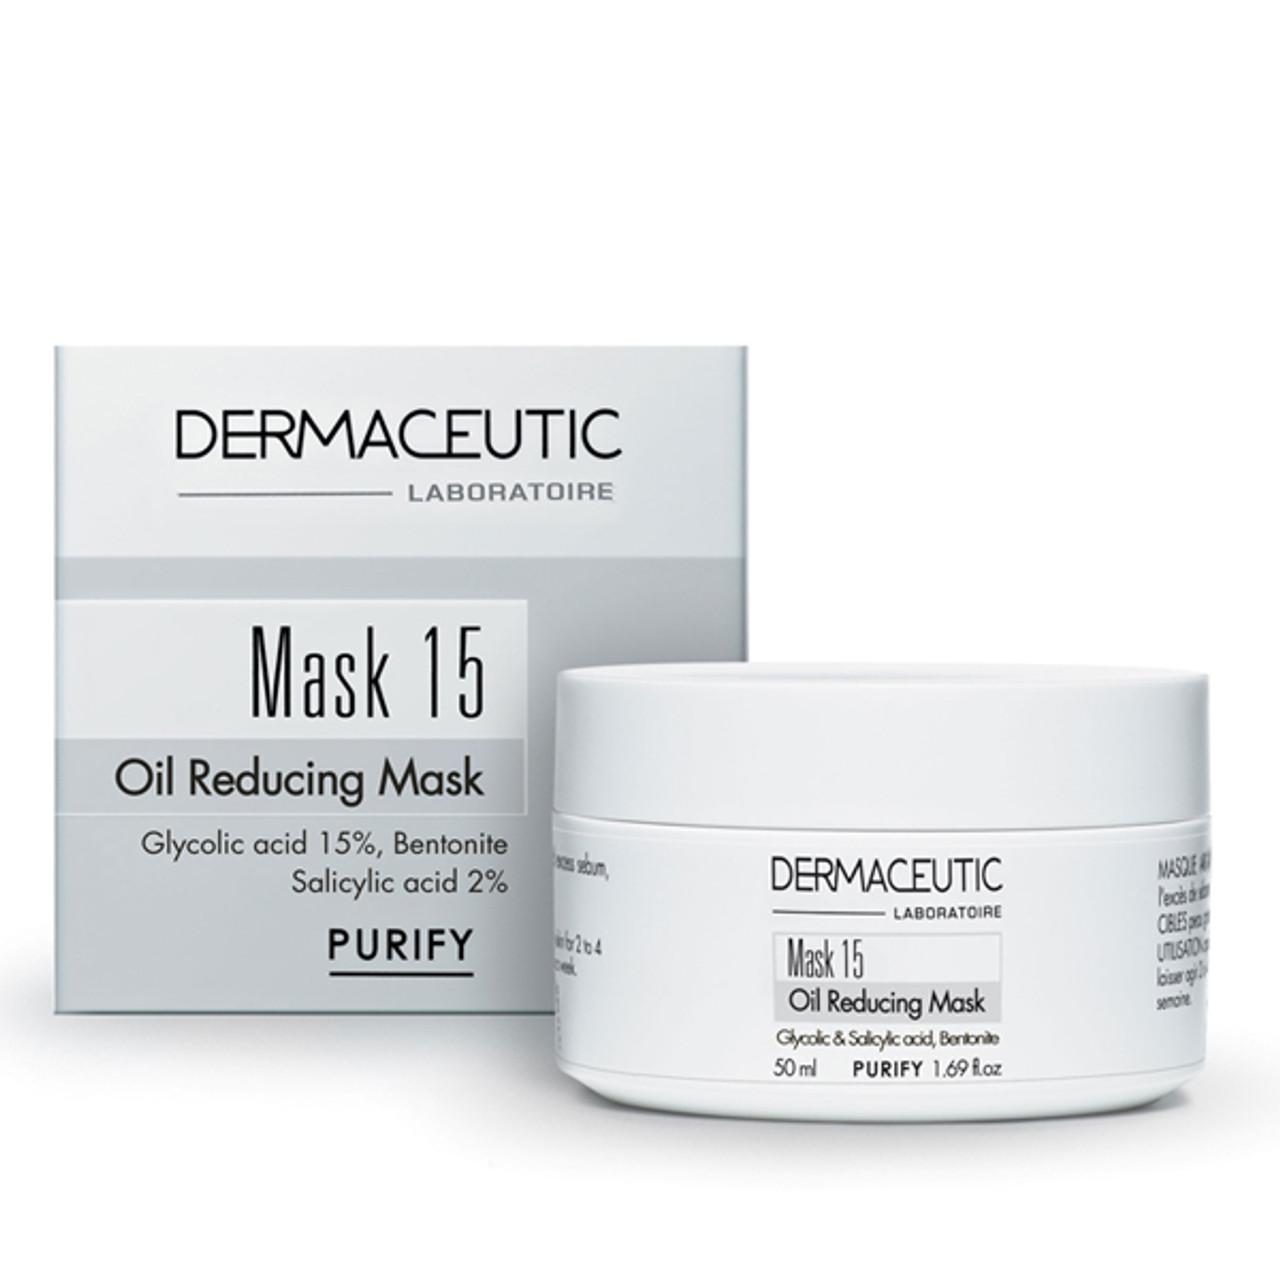 Dermaceutic Mask 15